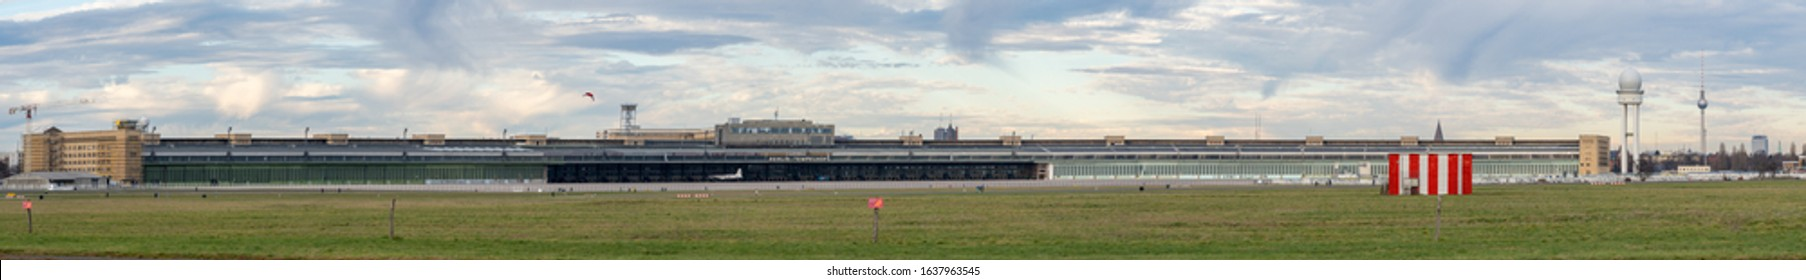 berlin, germany, January 2020: beautiful panorama view about the closed, former berlin tempelhof airport